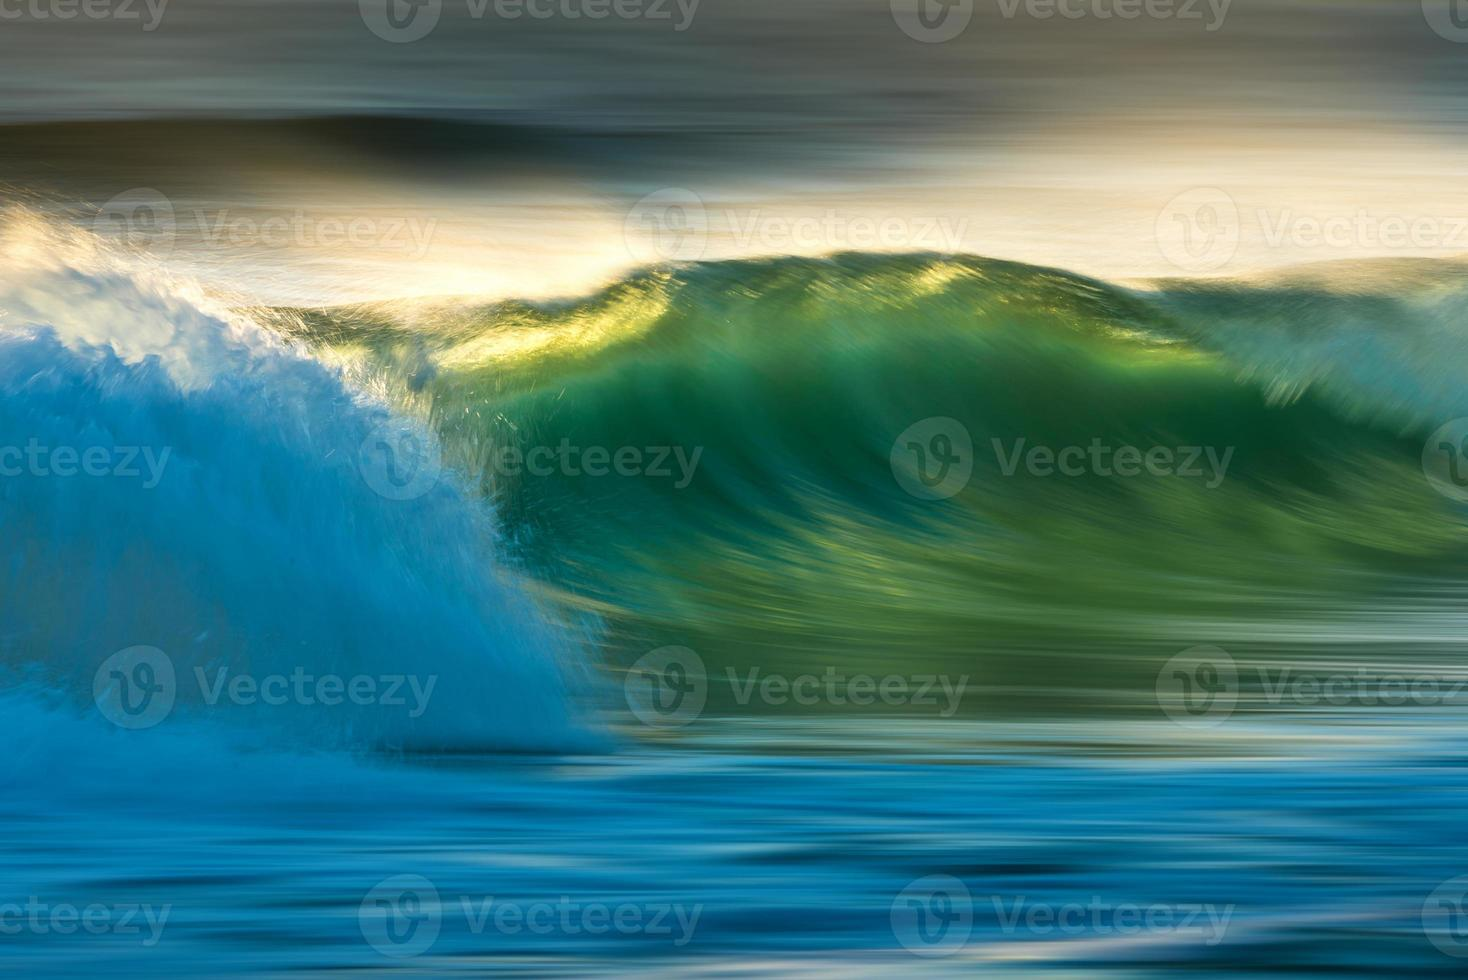 onda dell'oceano all'alba foto